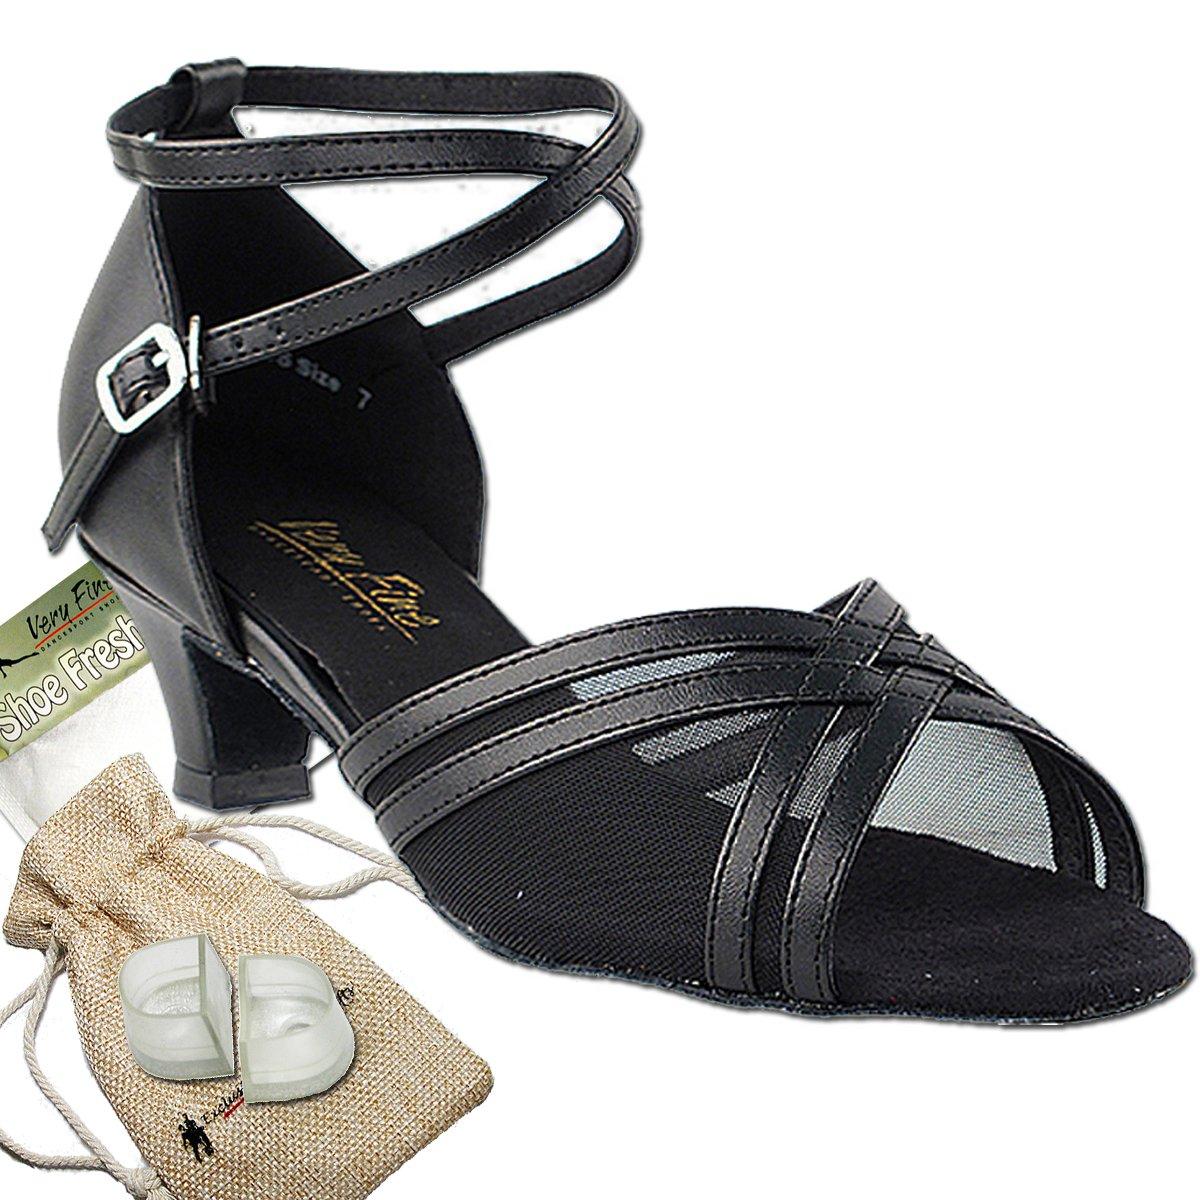 Women's Ballroom Dance Shoes Salsa Latin Practice Dance Shoes Black Leather & Black Mesh 5017EB Comfortable - Very Fine 1.3'' Heel 7 M US [Bundle of 5]